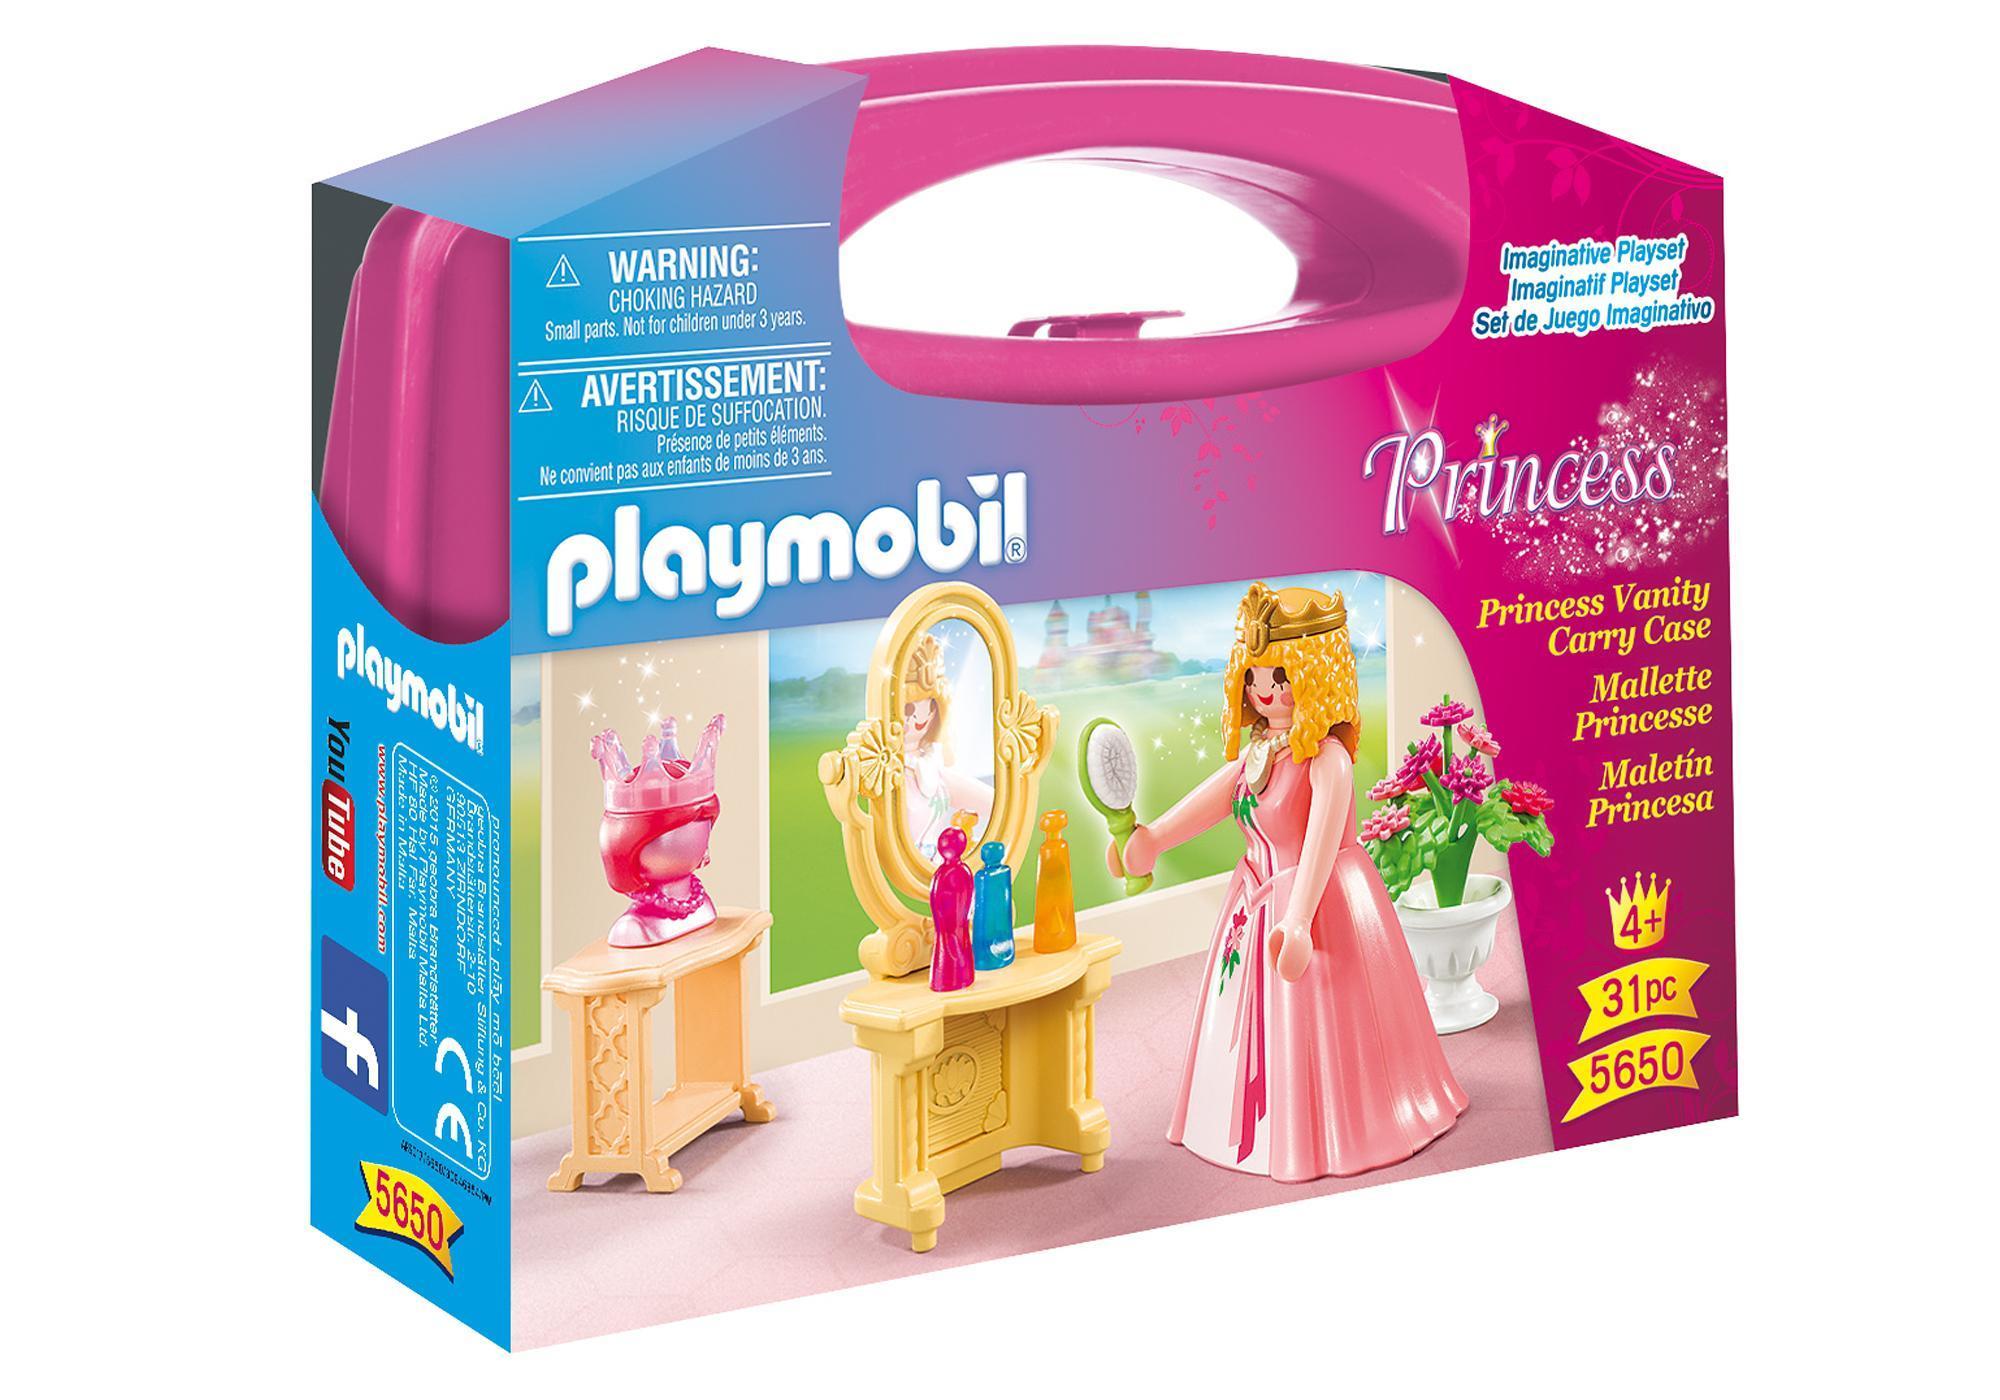 http://media.playmobil.com/i/playmobil/5650_product_detail/Princess Vanity Carry Case